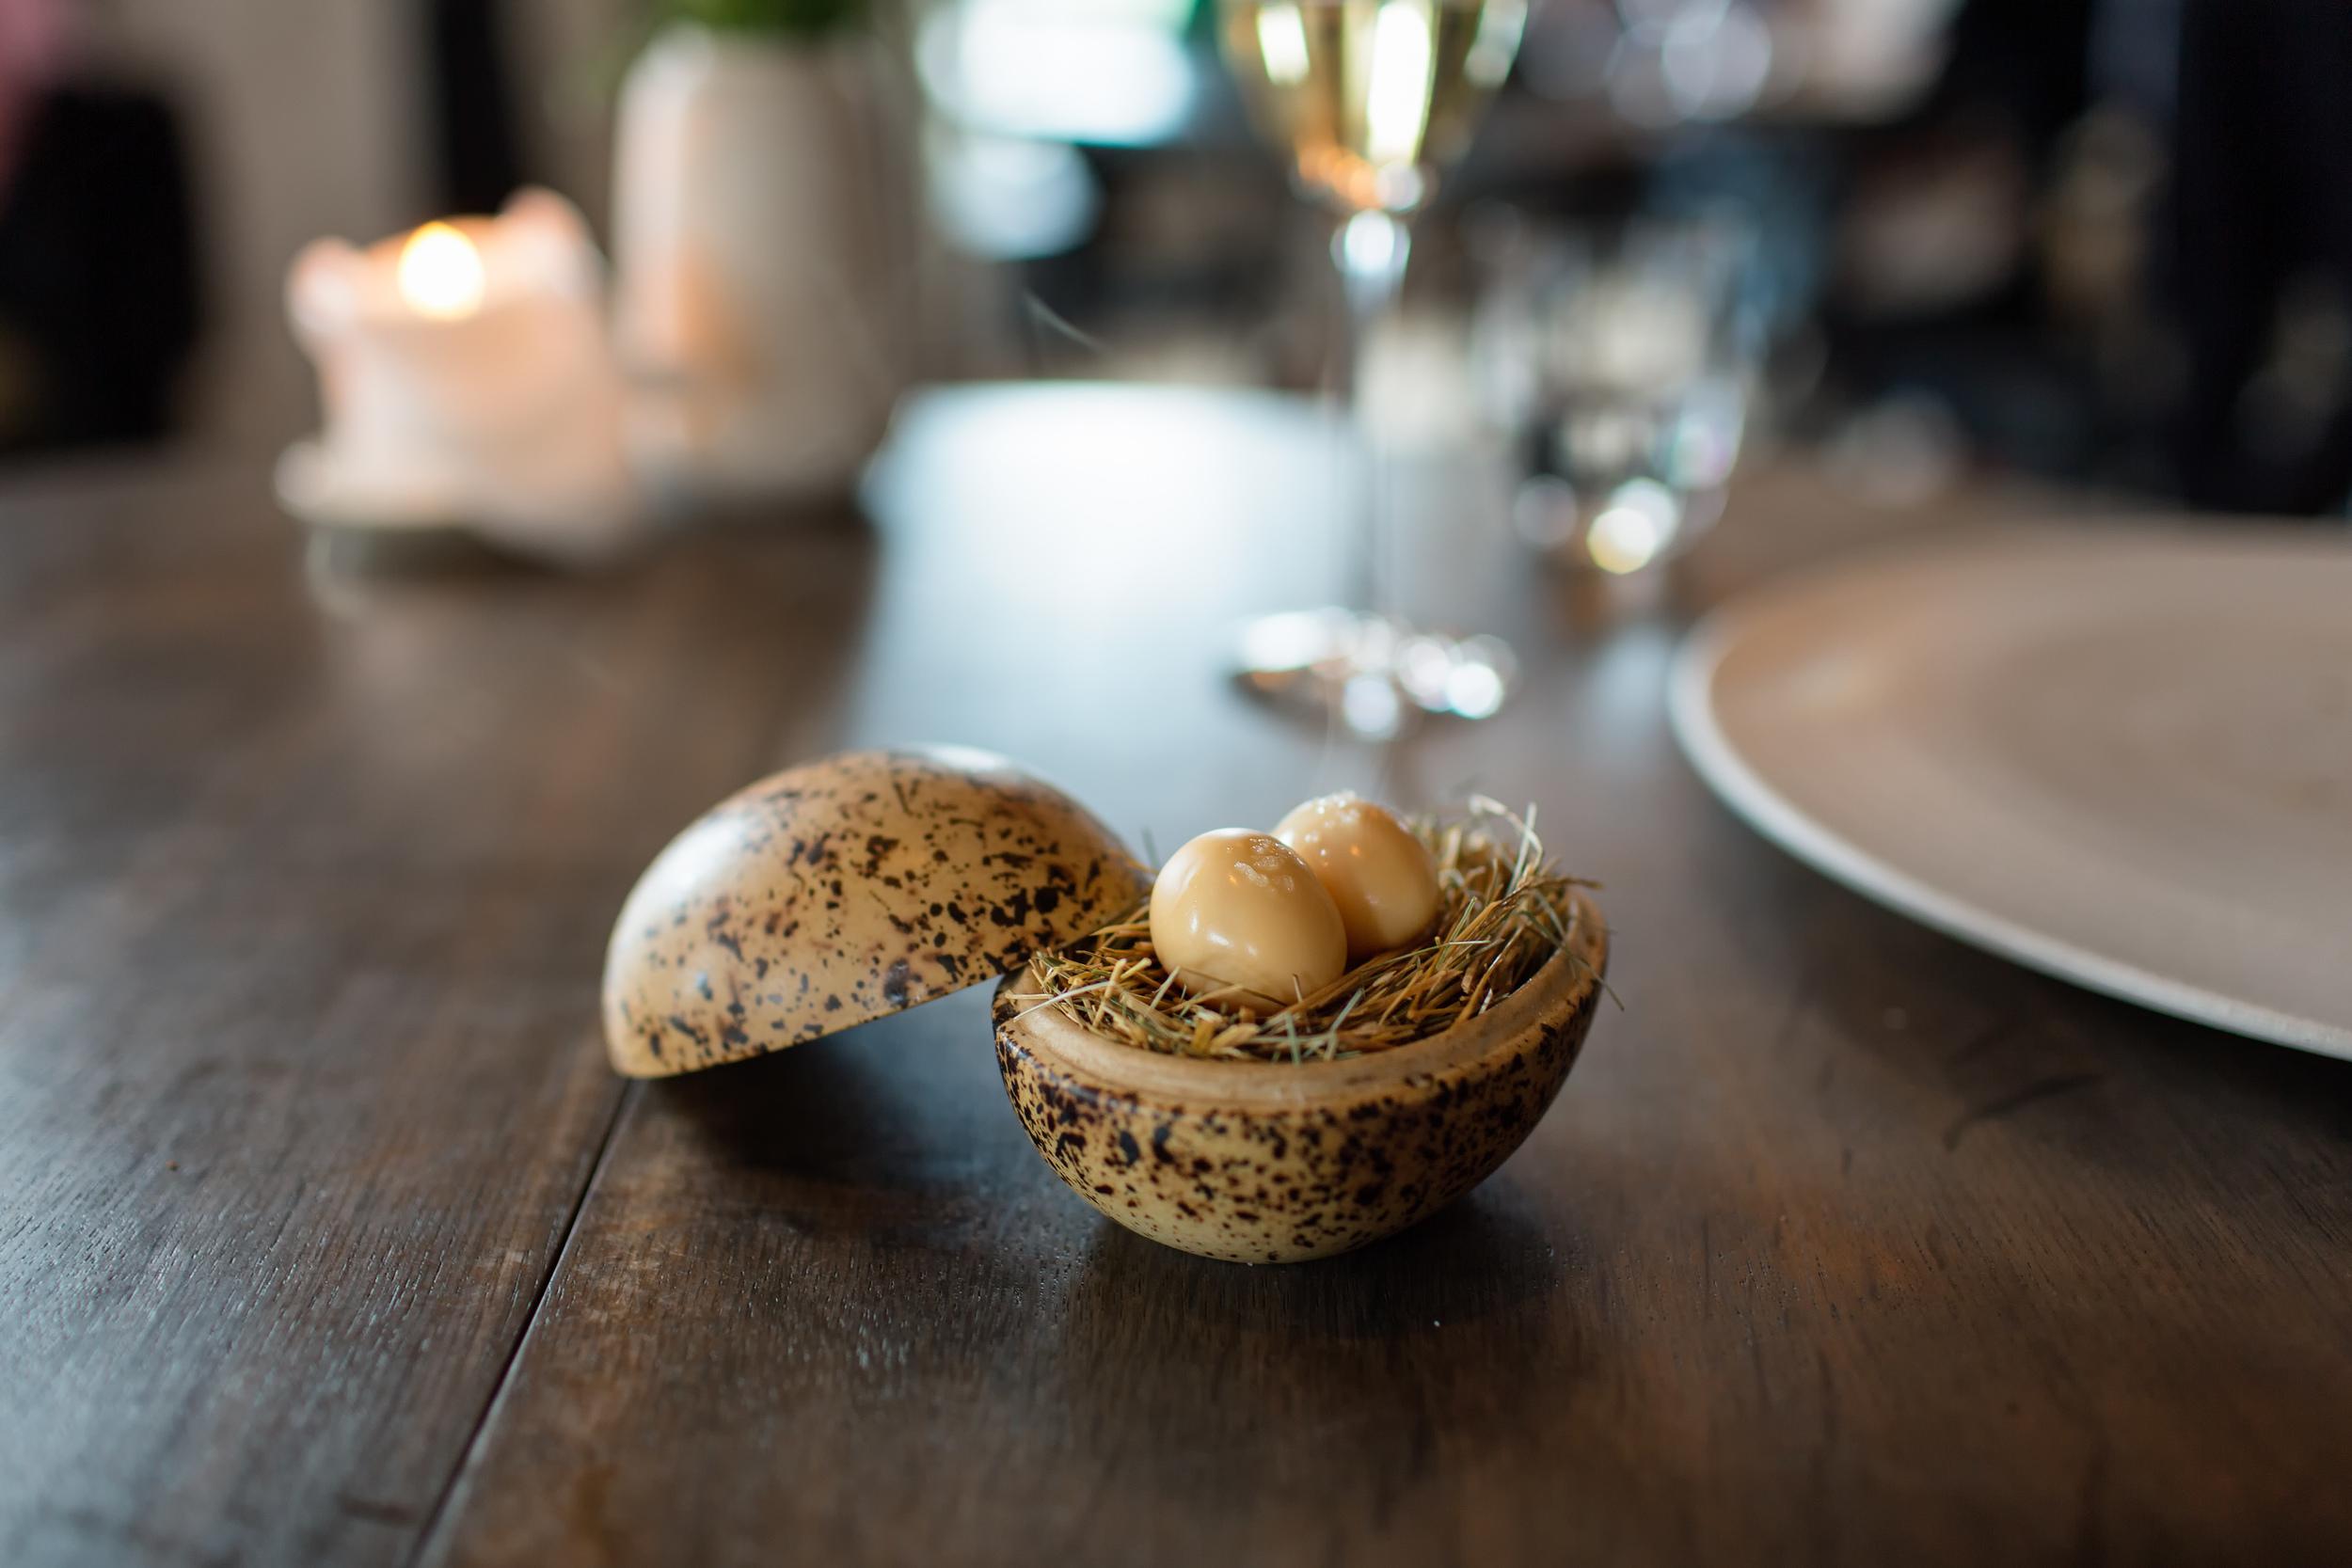 Pickled and smoked quails egg @ Noma (Copenhagen, Denmark).